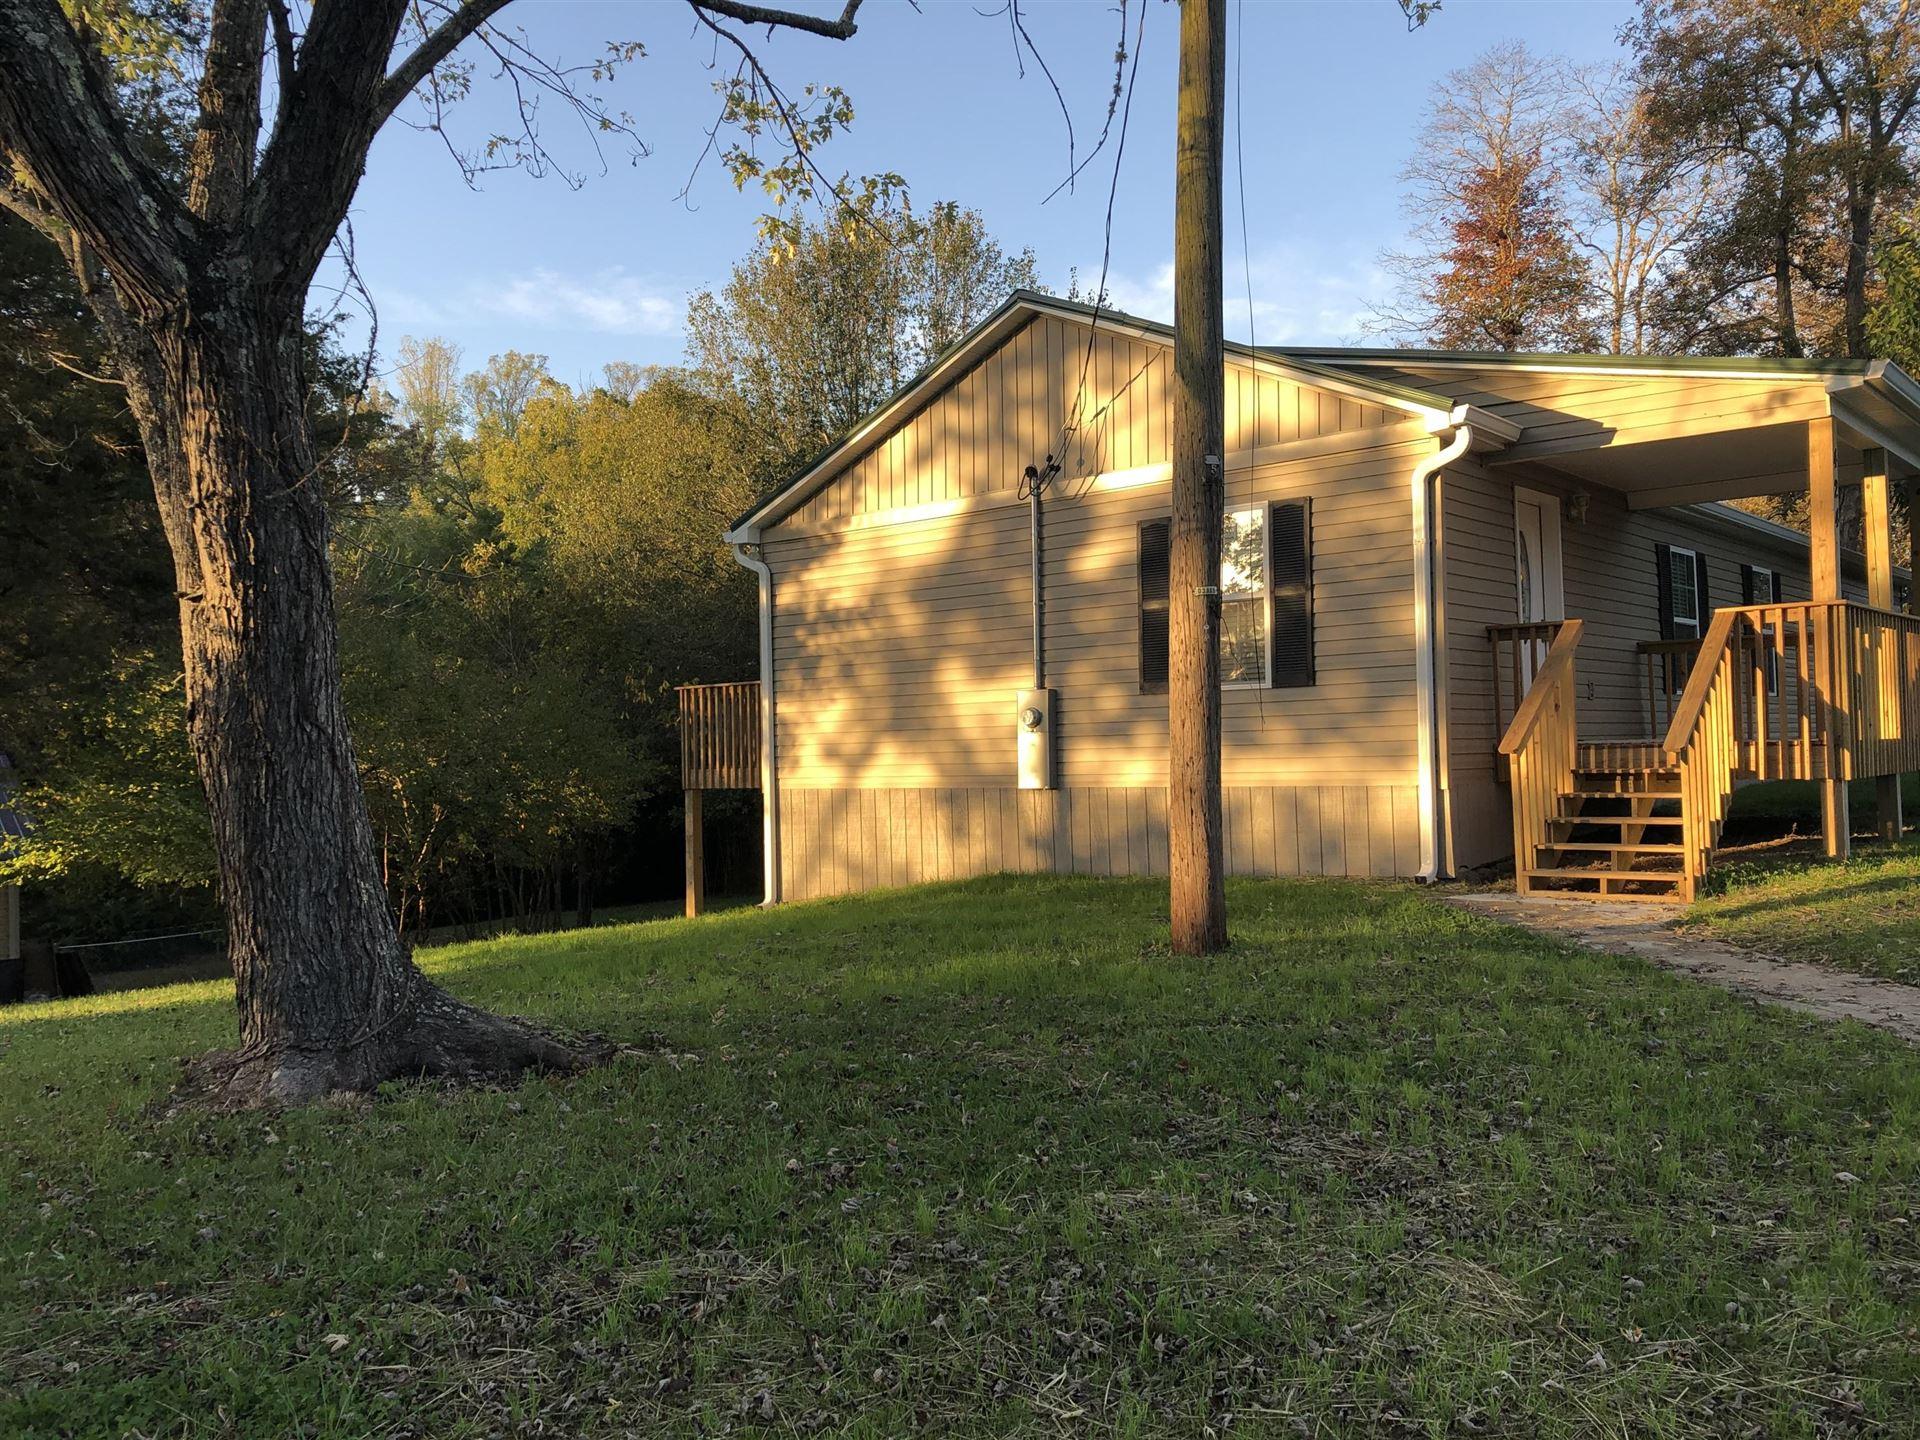 Photo of 424 Robertsville Rd, Oak Ridge, TN 37830 (MLS # 1132990)